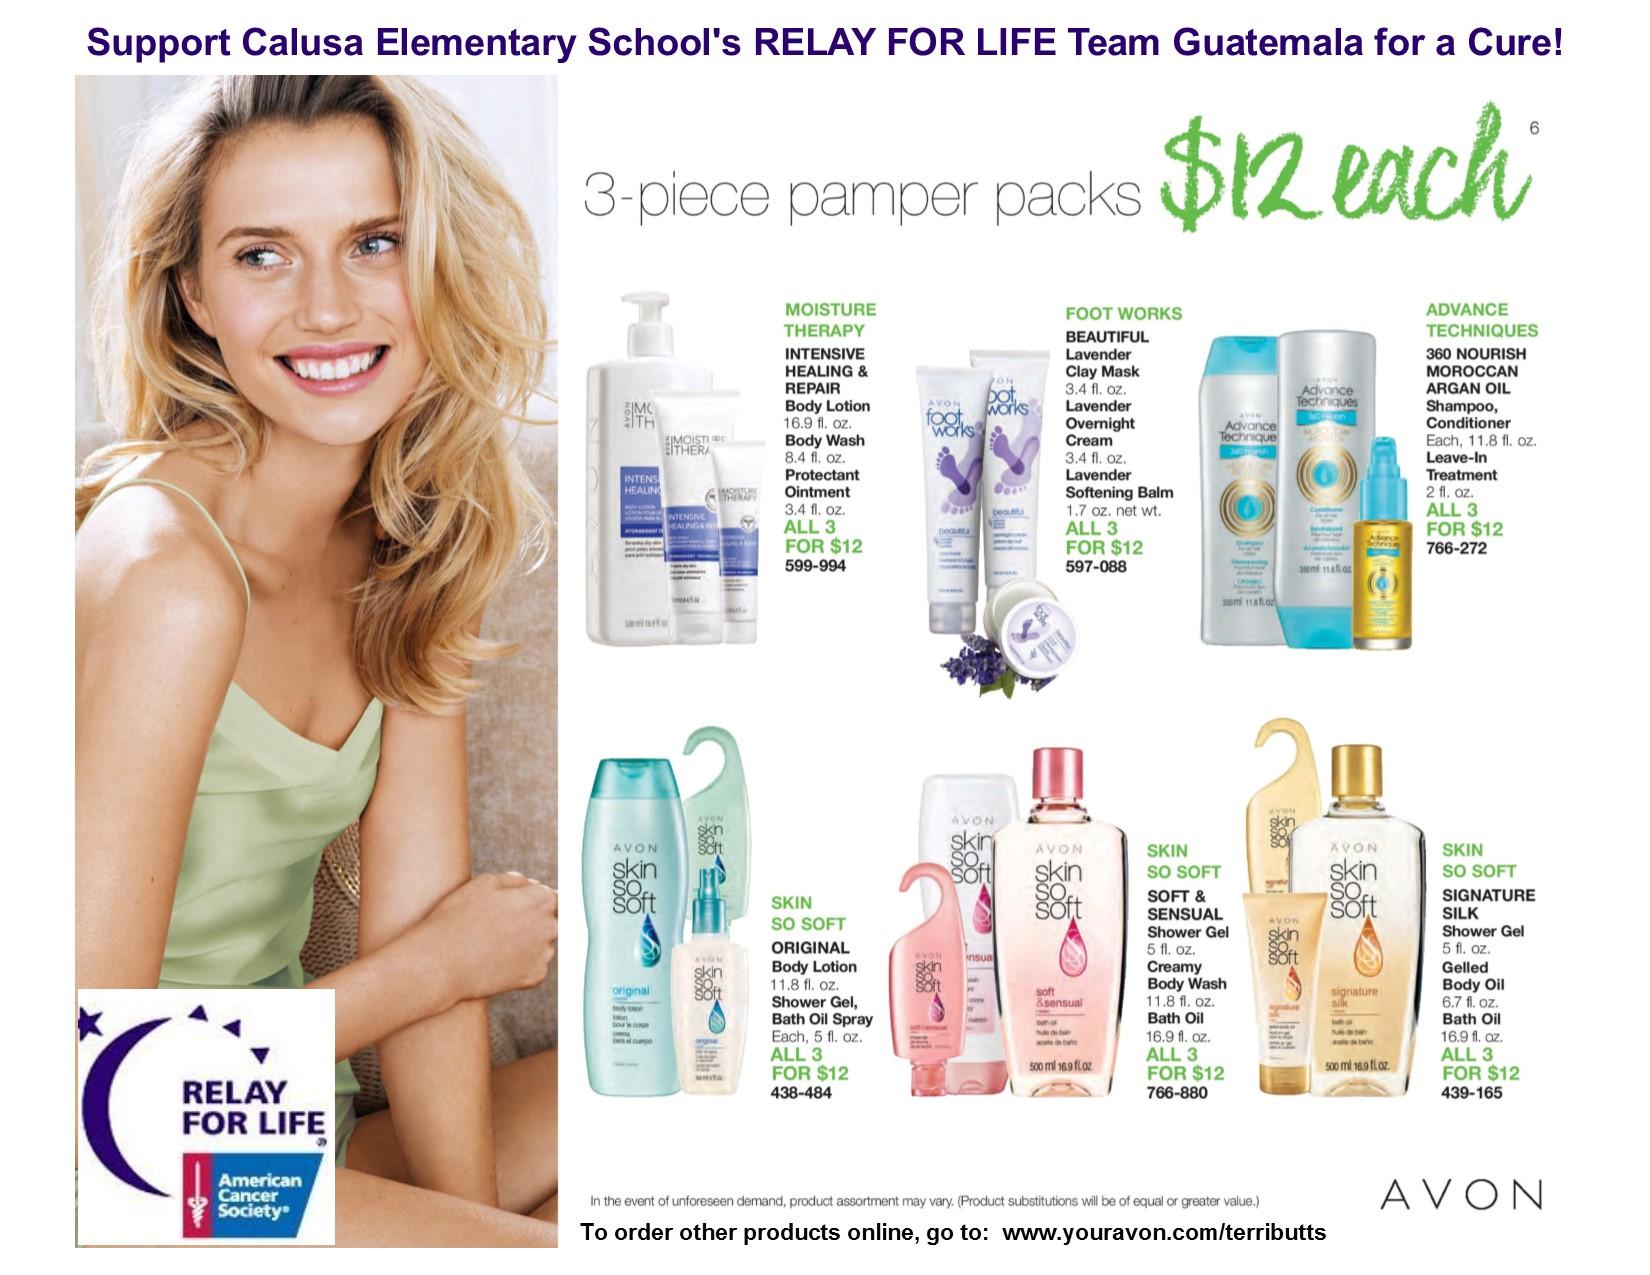 Avon relay fundraiser